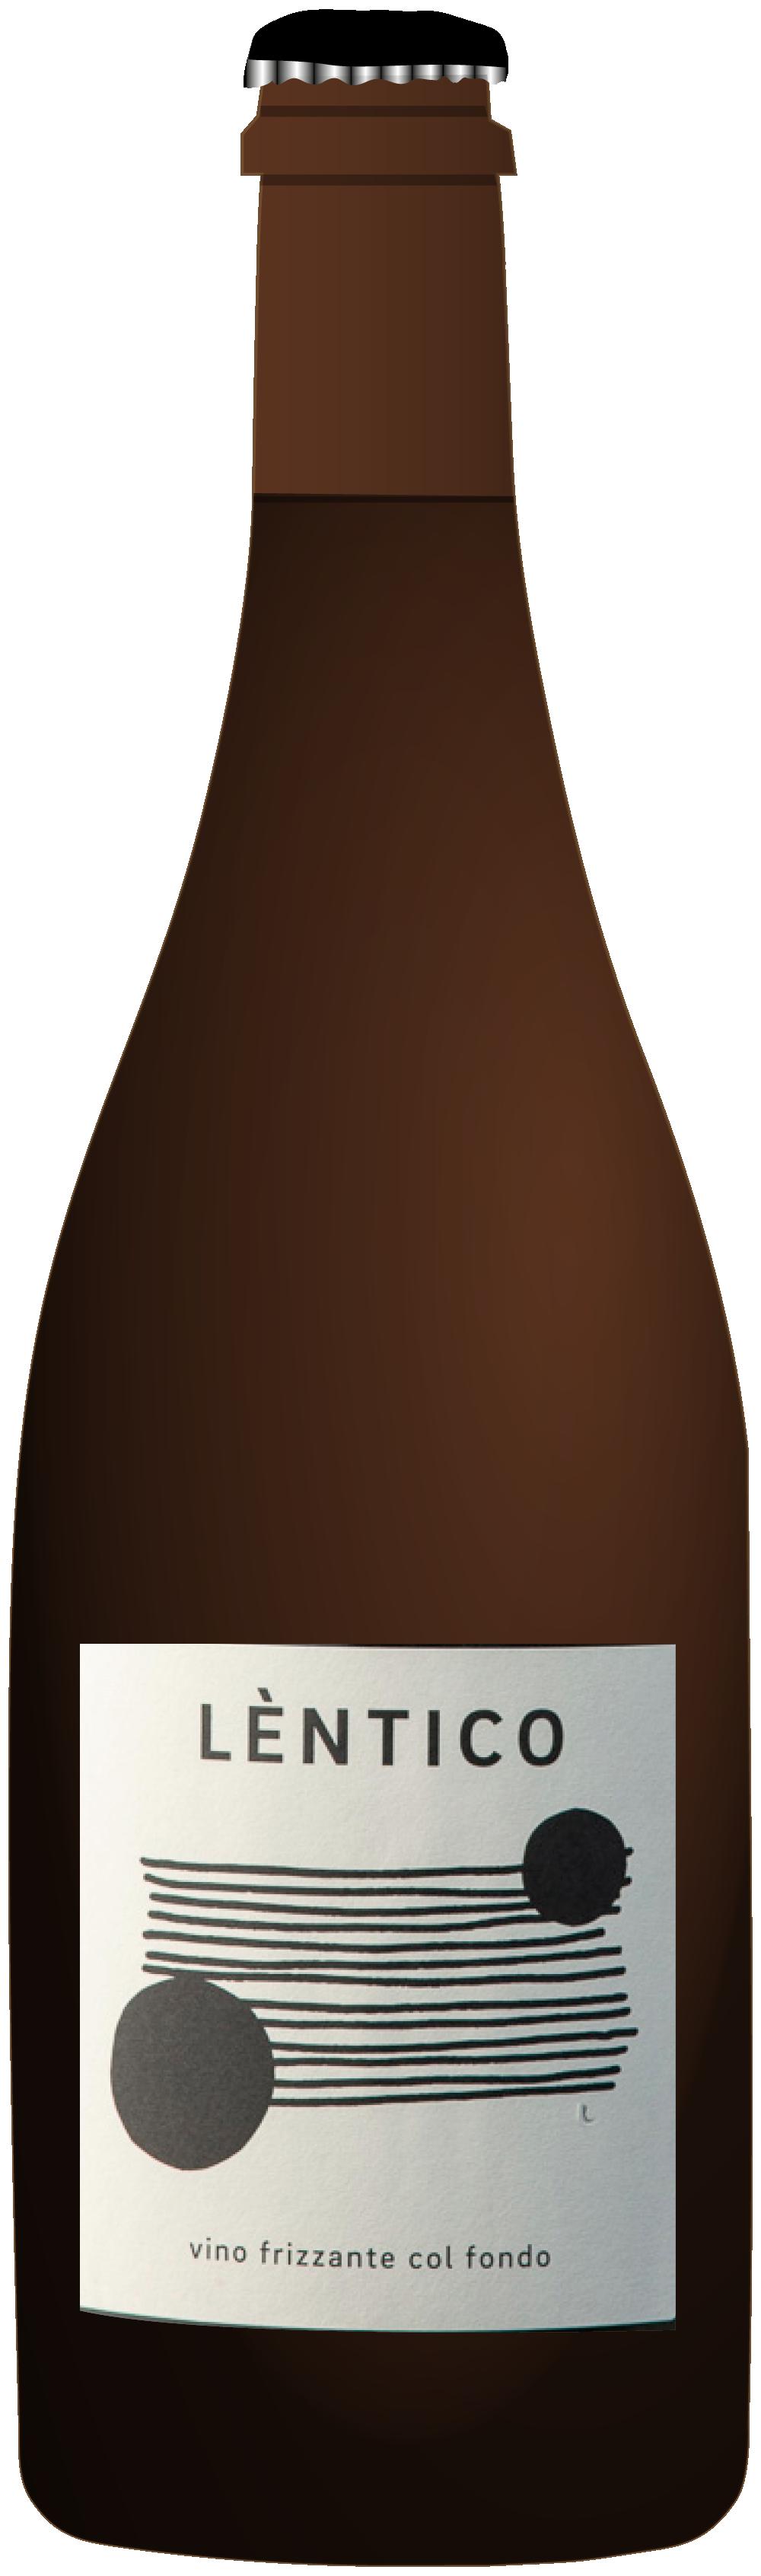 the natural wine company club february 2021 italy morandin lentico